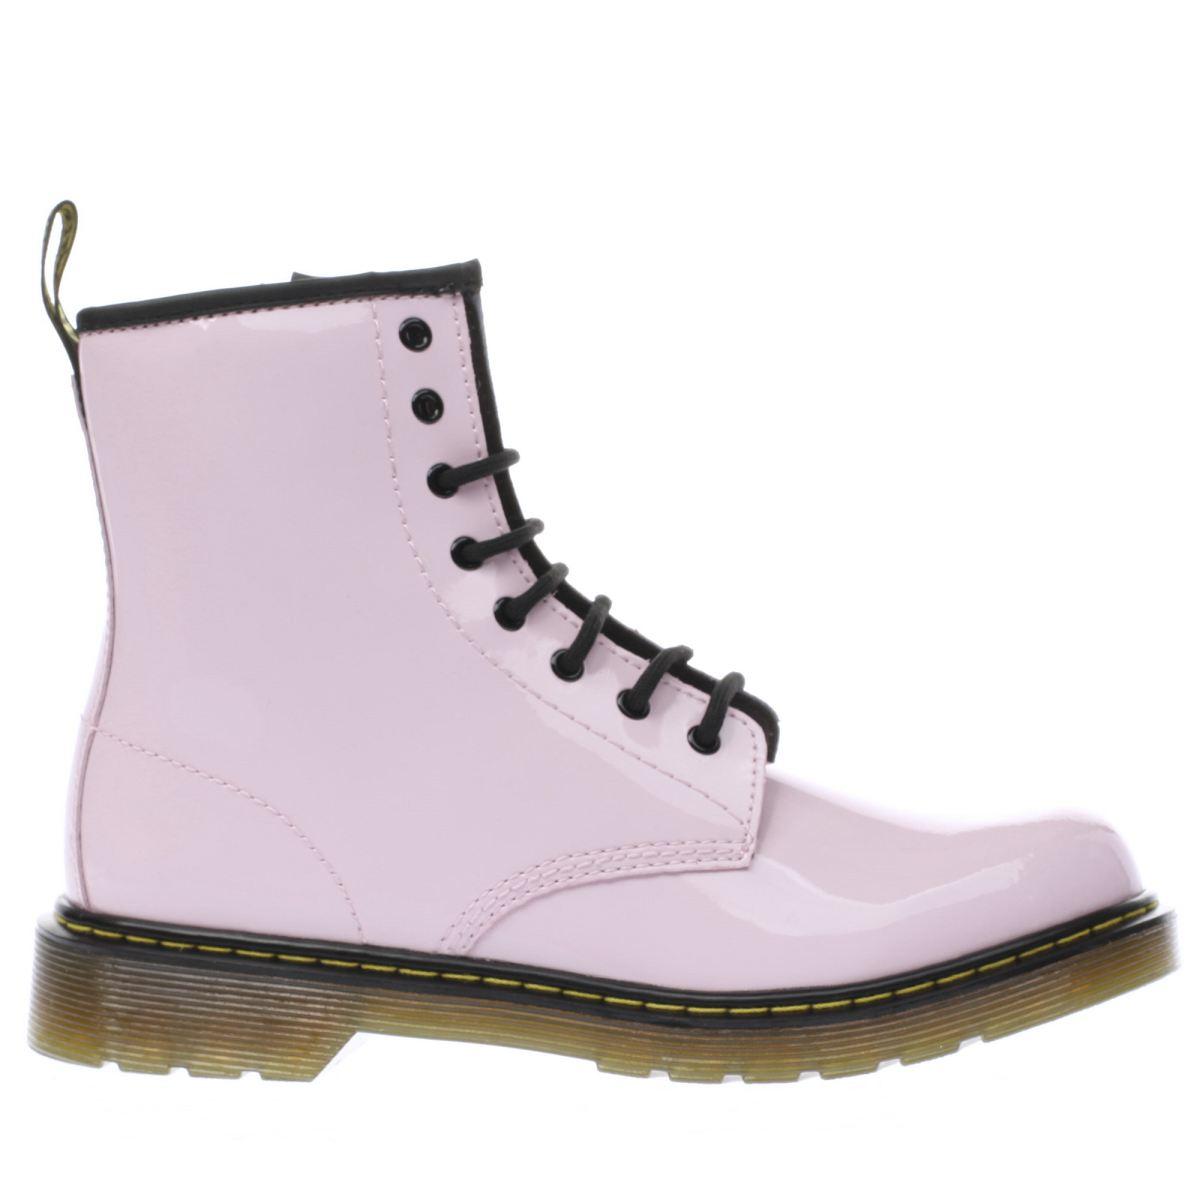 dr martens pale pink delaney Girls Youth Boots